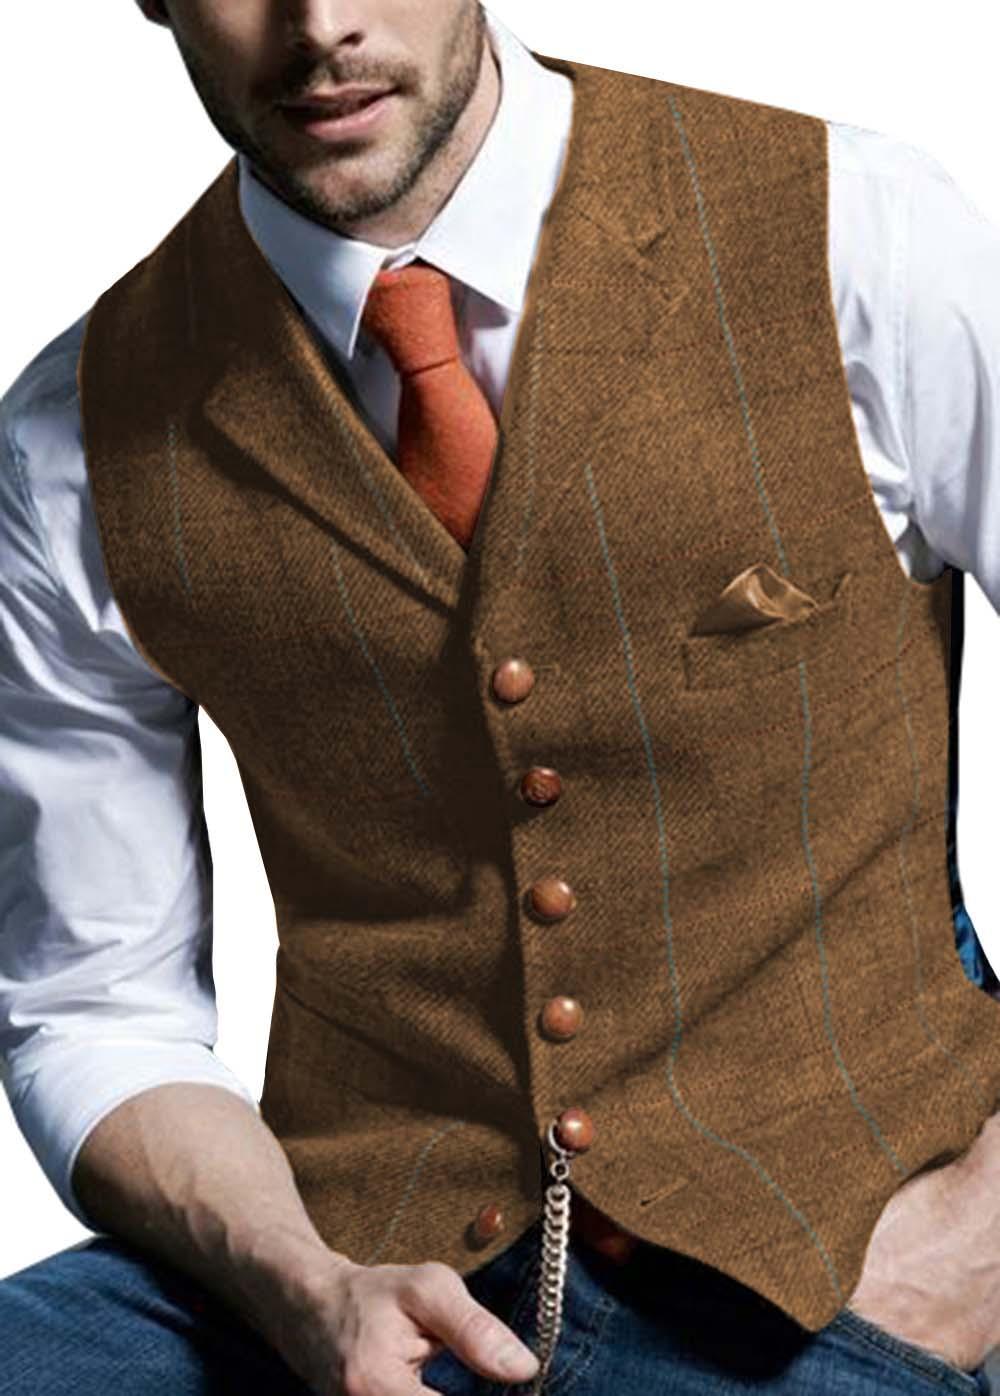 Green Men's Plaid Vest Tweed Wool Waistcoat Slim Fit Lapel Plaid Suit Vest Casual Groomsmen Tuxedo For Wedding,2019 New